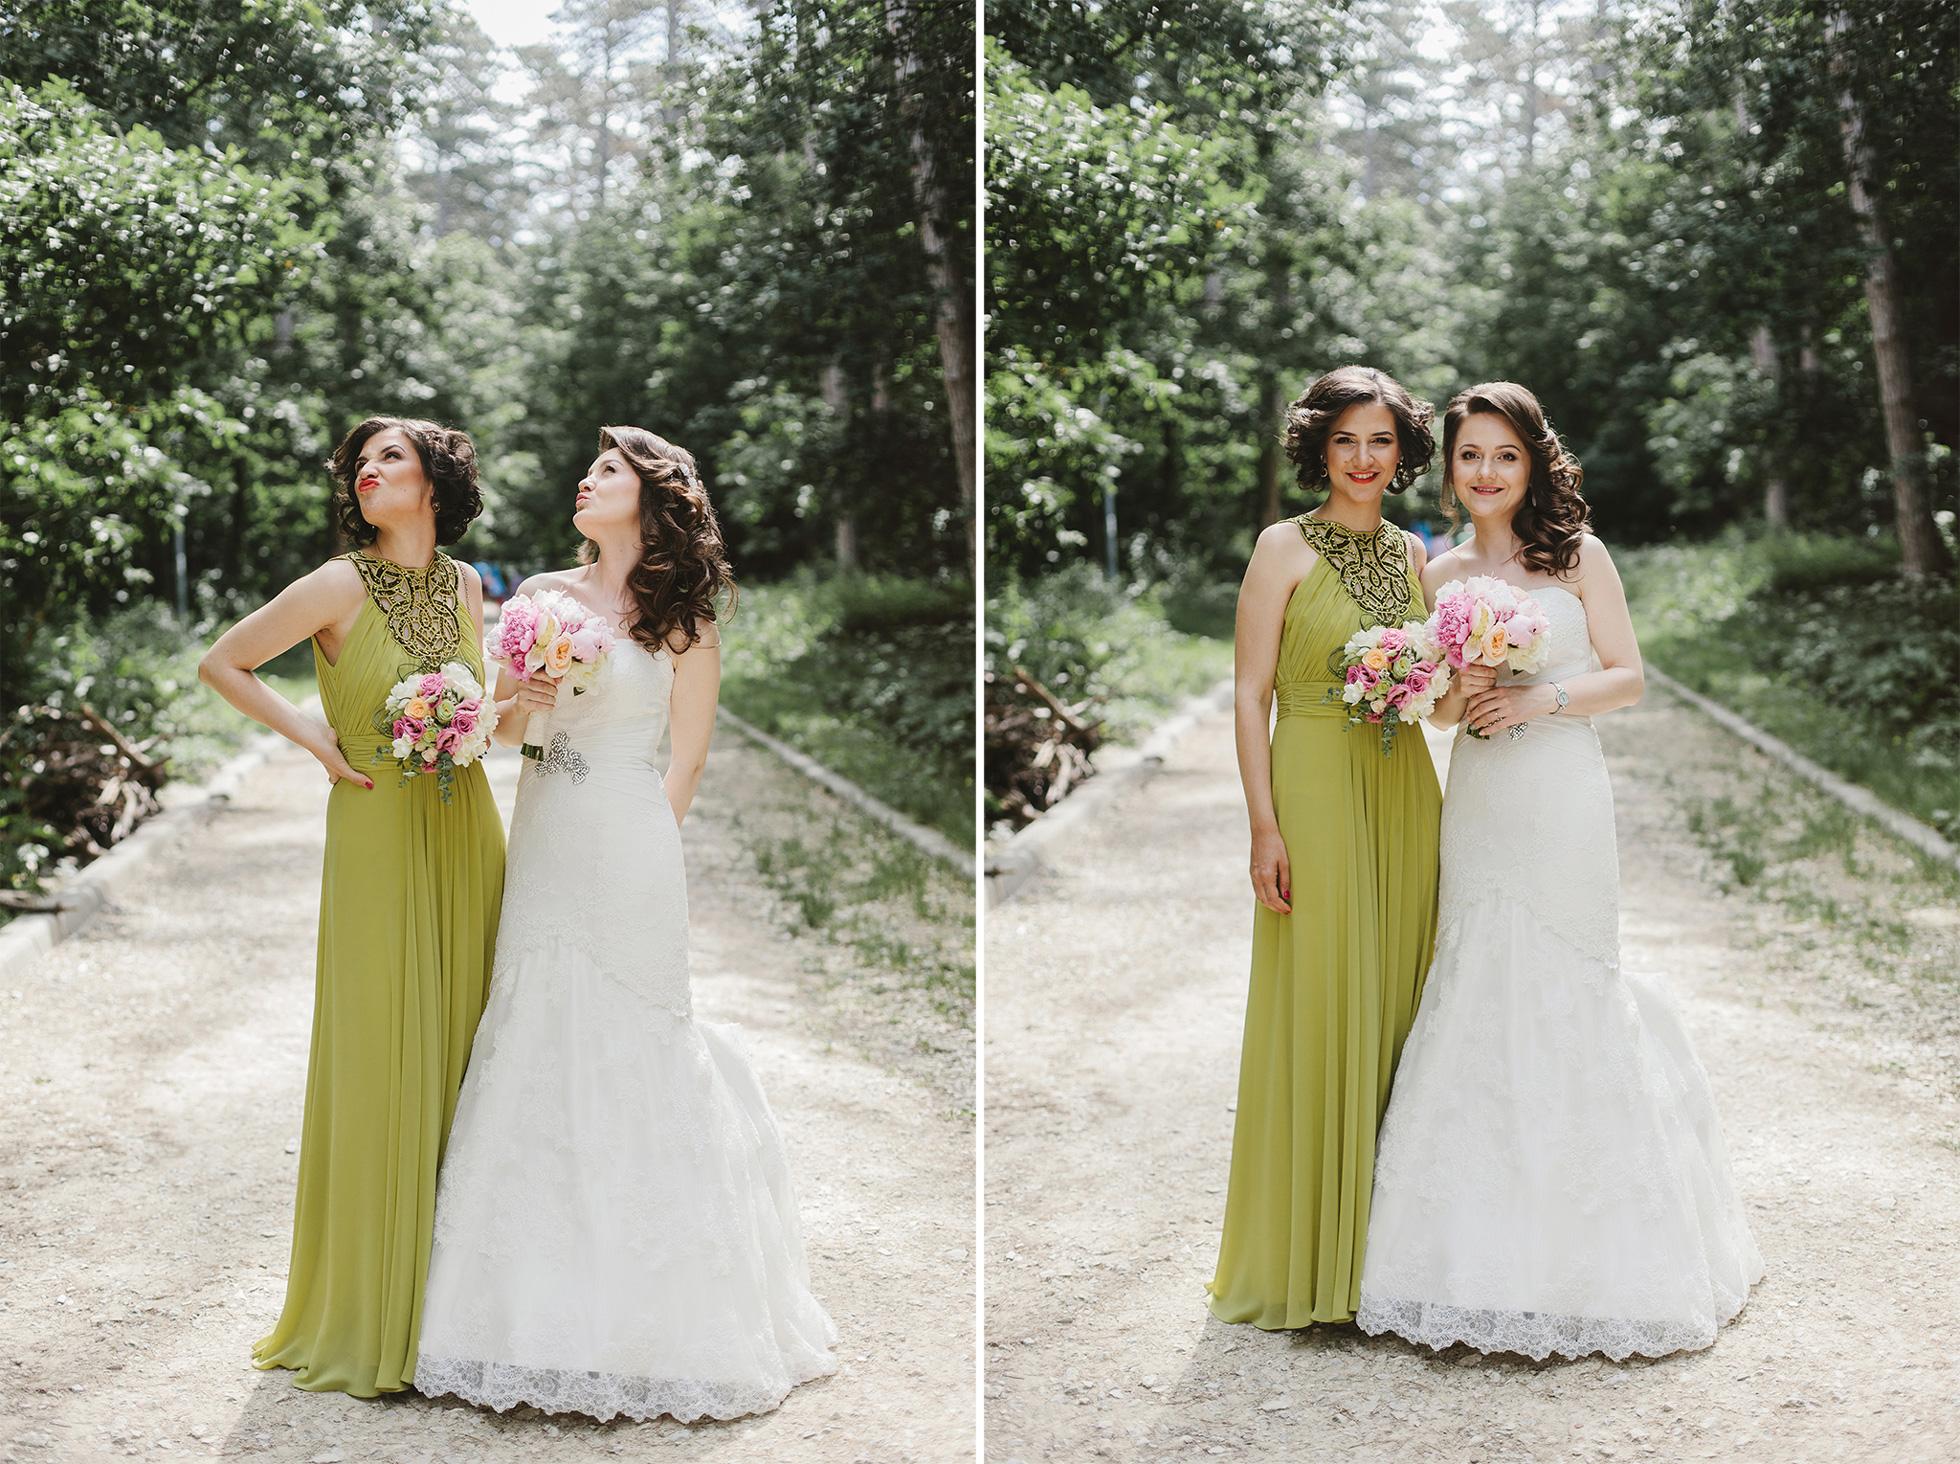 Liana-+-Florin-{wedding}-056